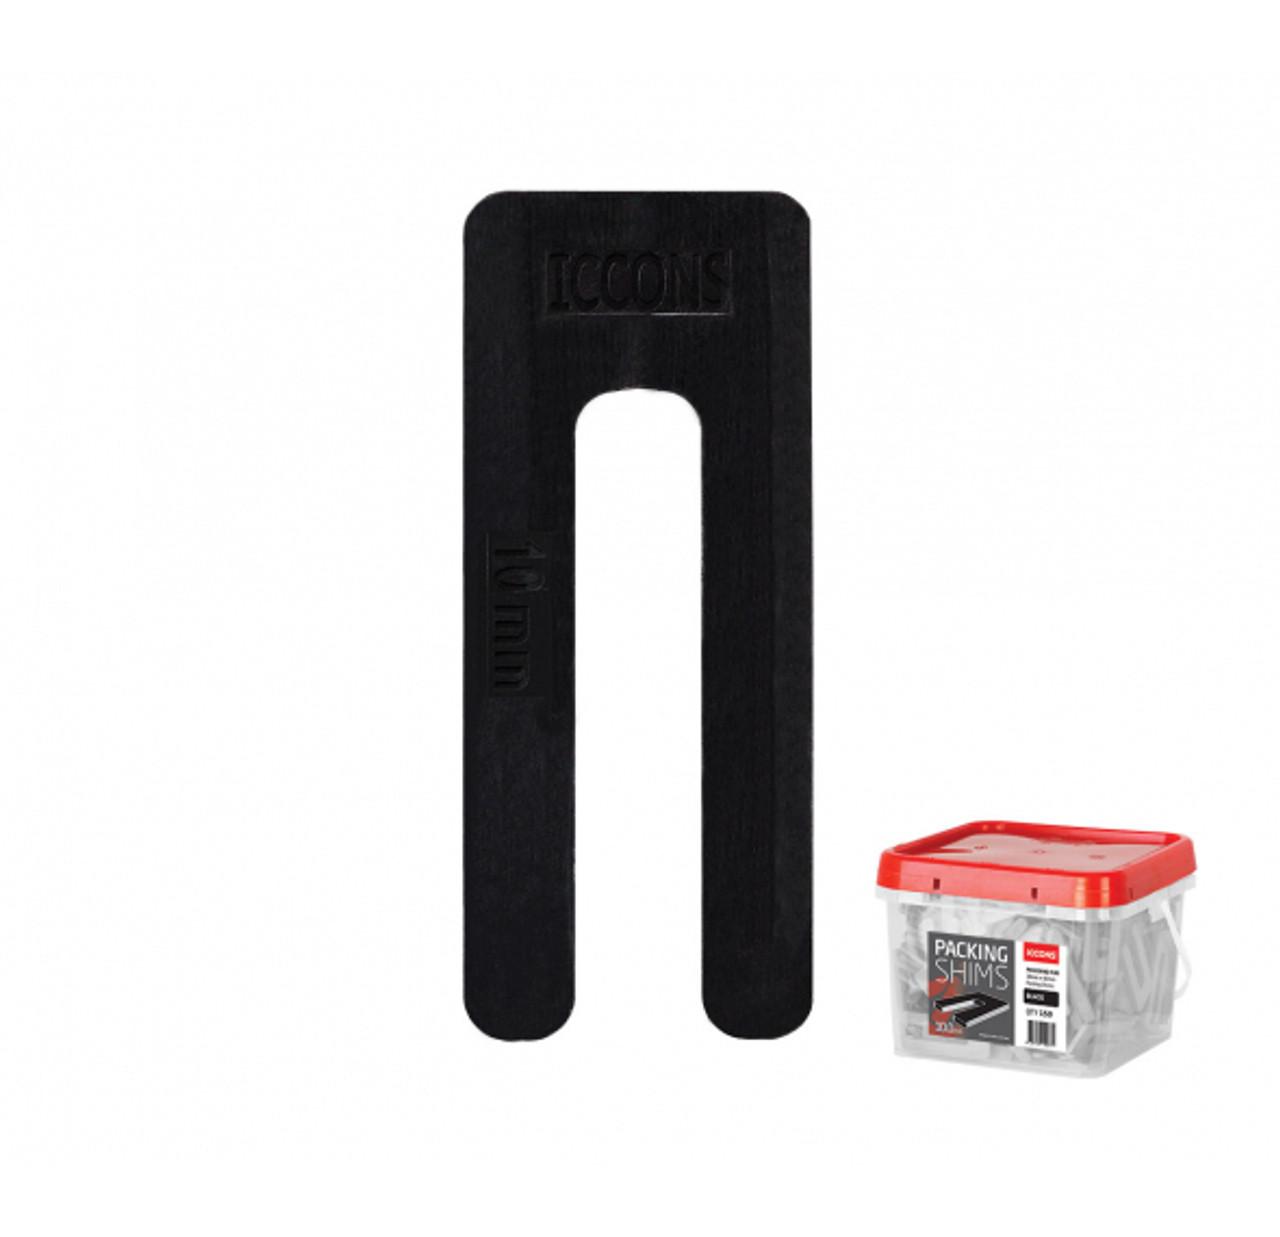 WINDOW PACKER - SHIM TUB ICCONS MIXED OptionS 400pce